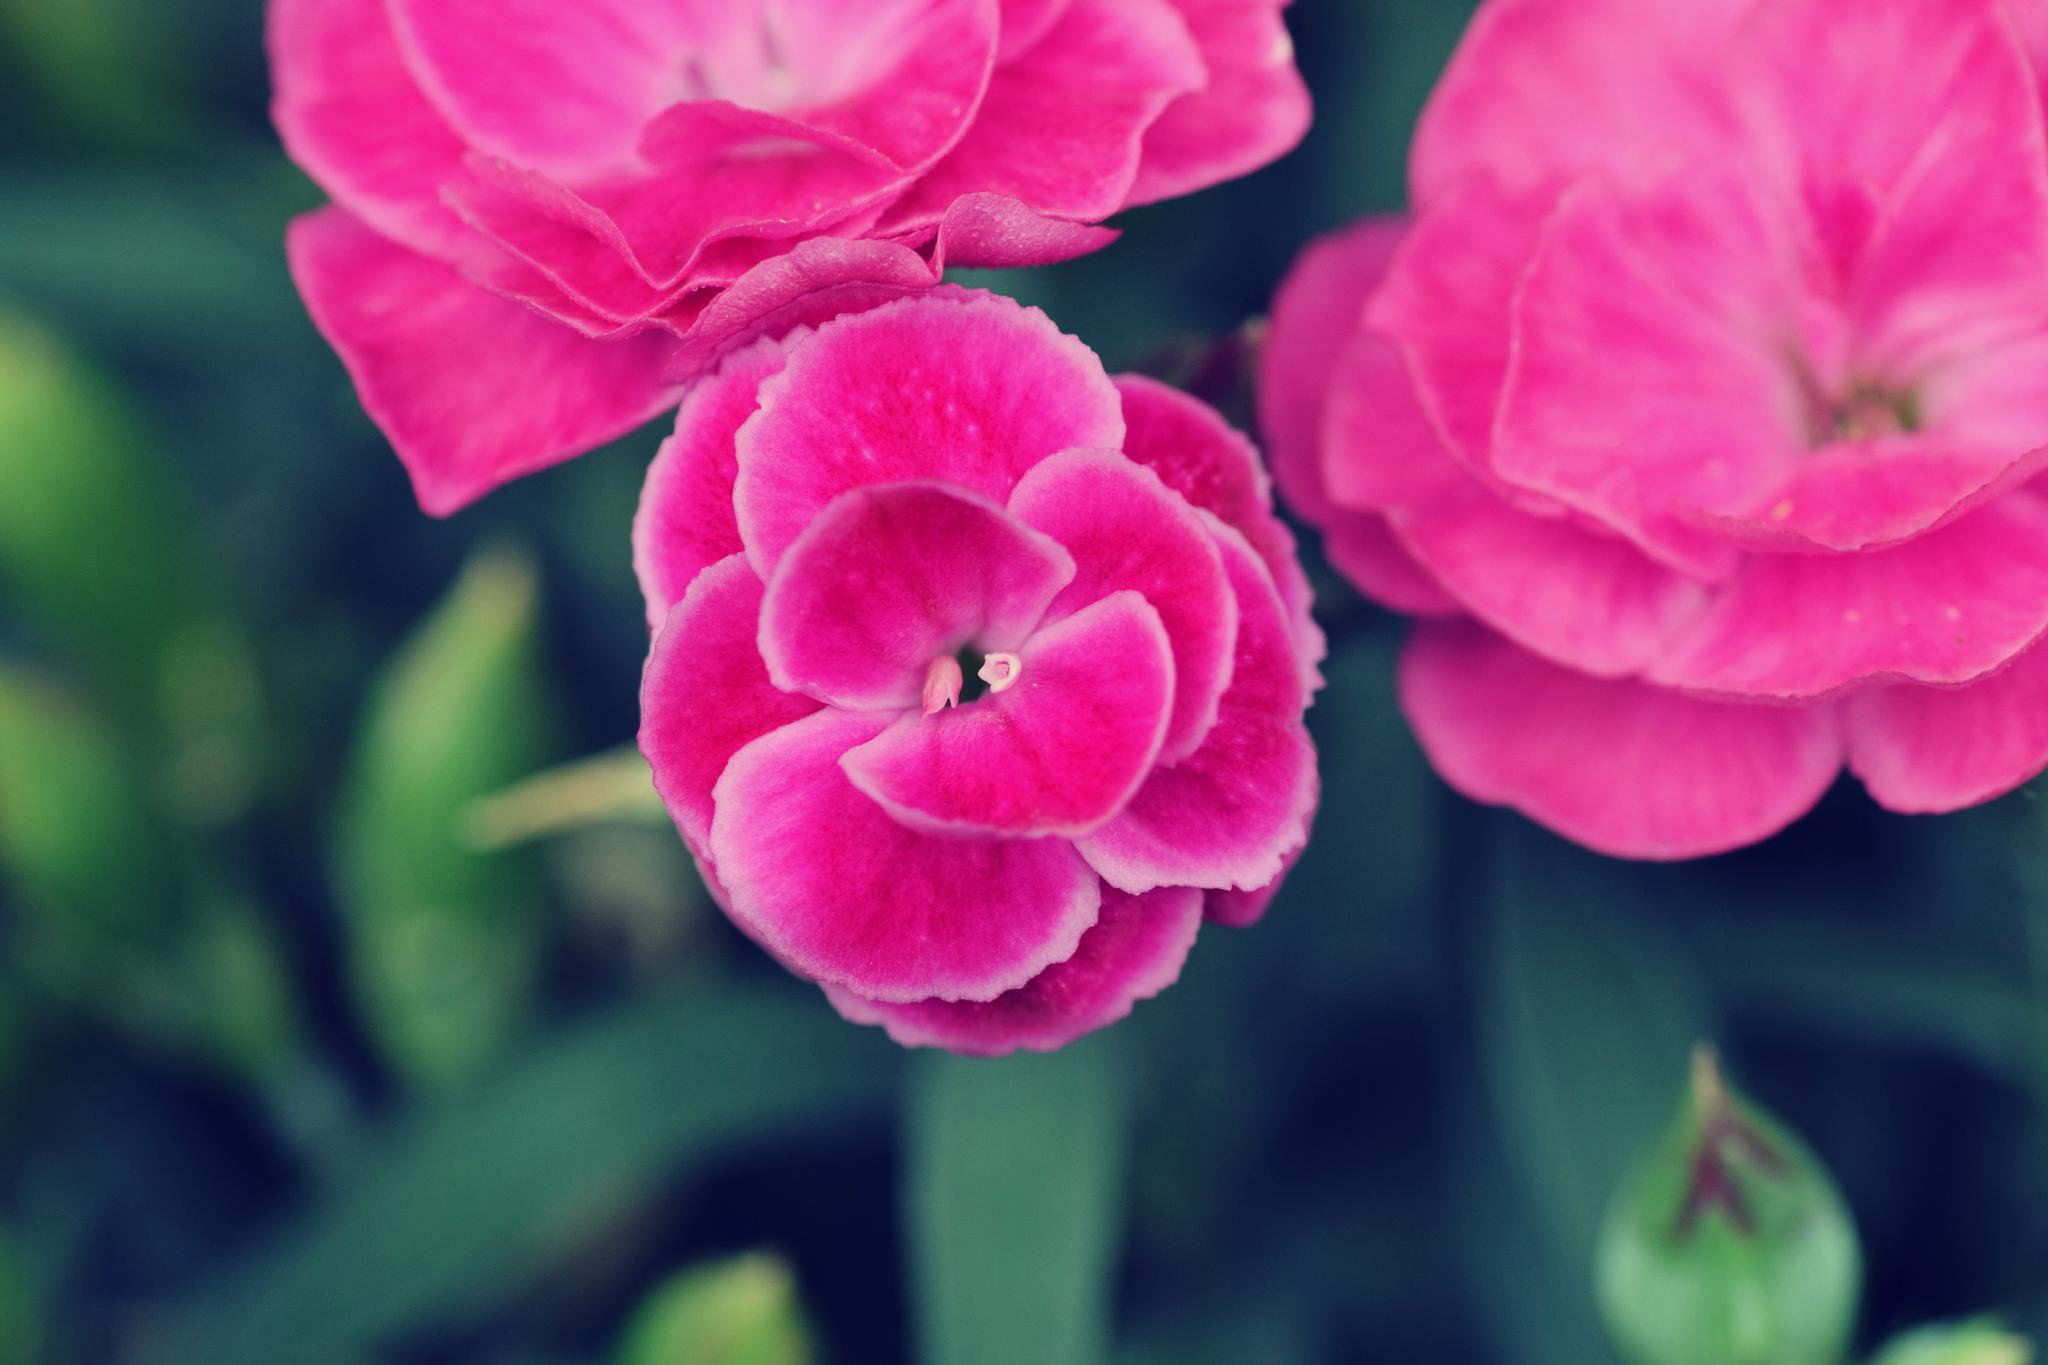 Flower by Solaika